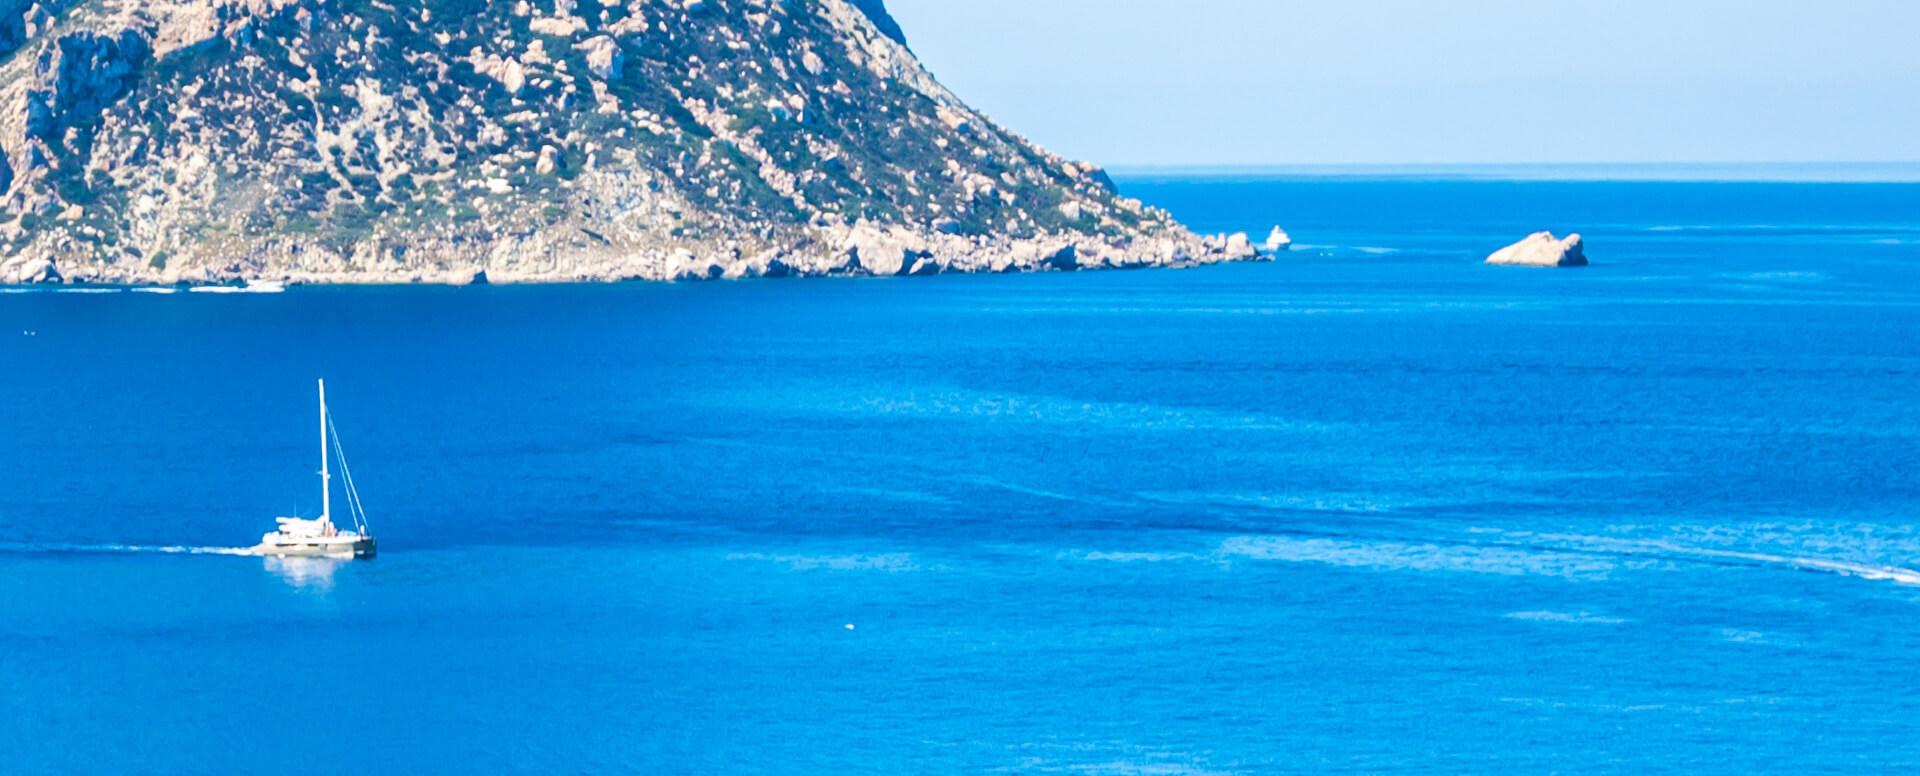 Excursions et plaisirs maritimes - Ibiza